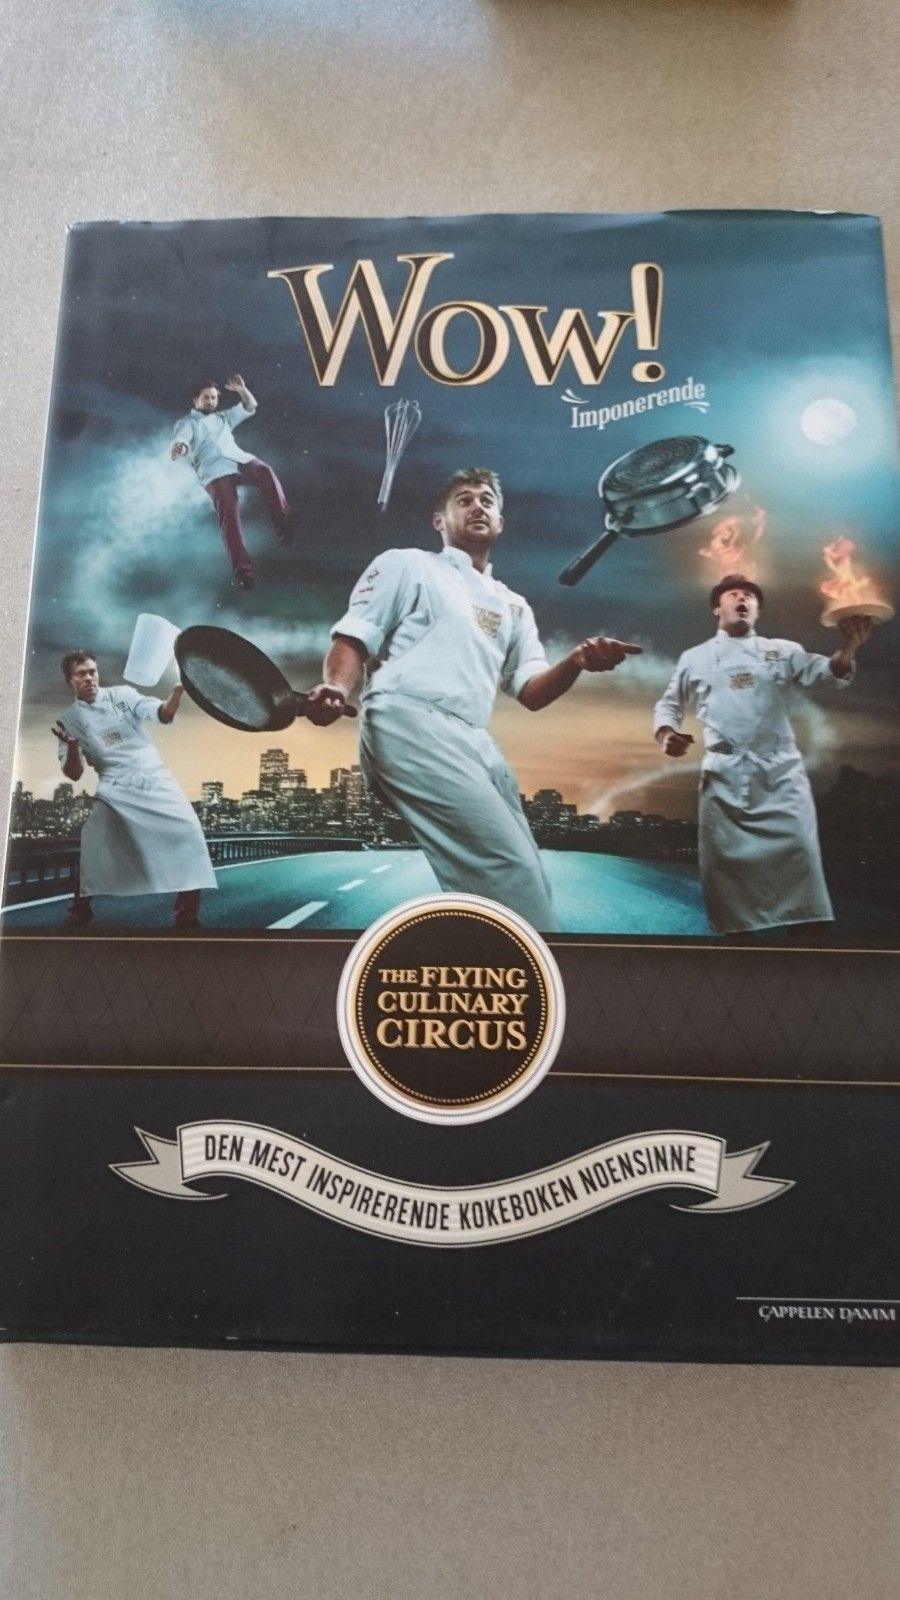 Wow av the flying culinary circus - Oslo  - Wow av the flying culinary circus. - Oslo